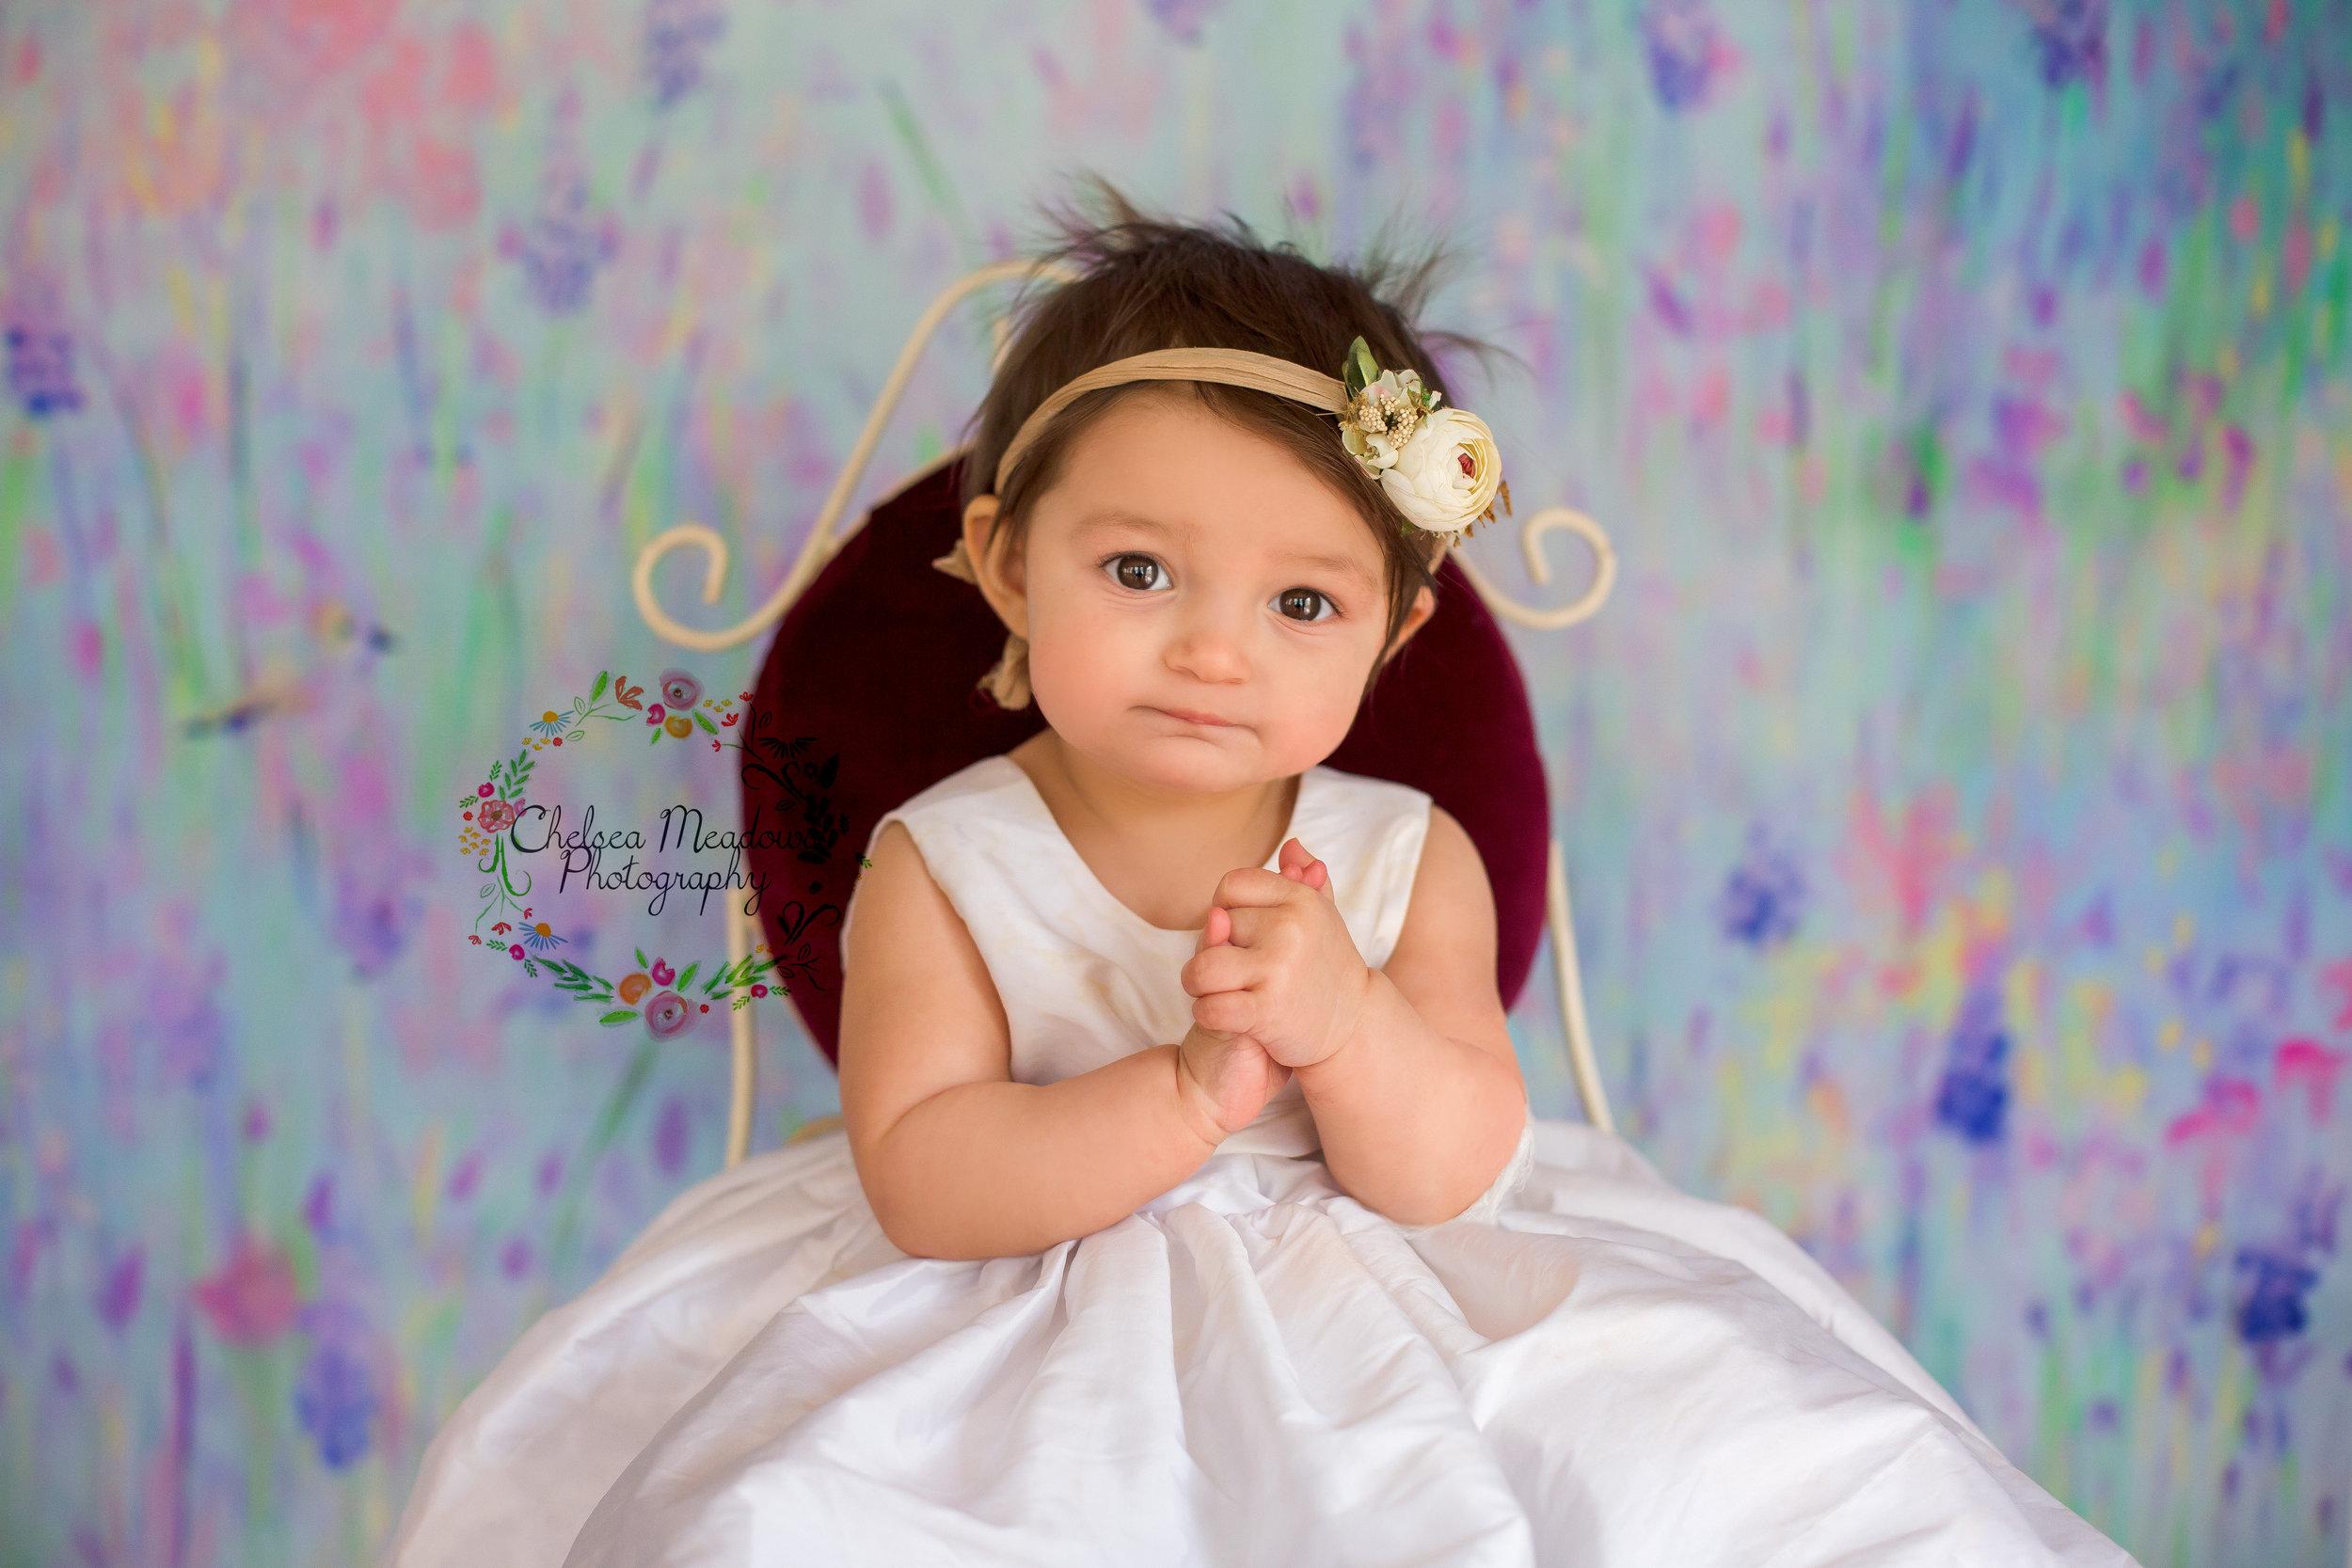 Ellis Family Spring Minis - Nashville Family Photographer - Chelsea Meadows Photography (17).jpg